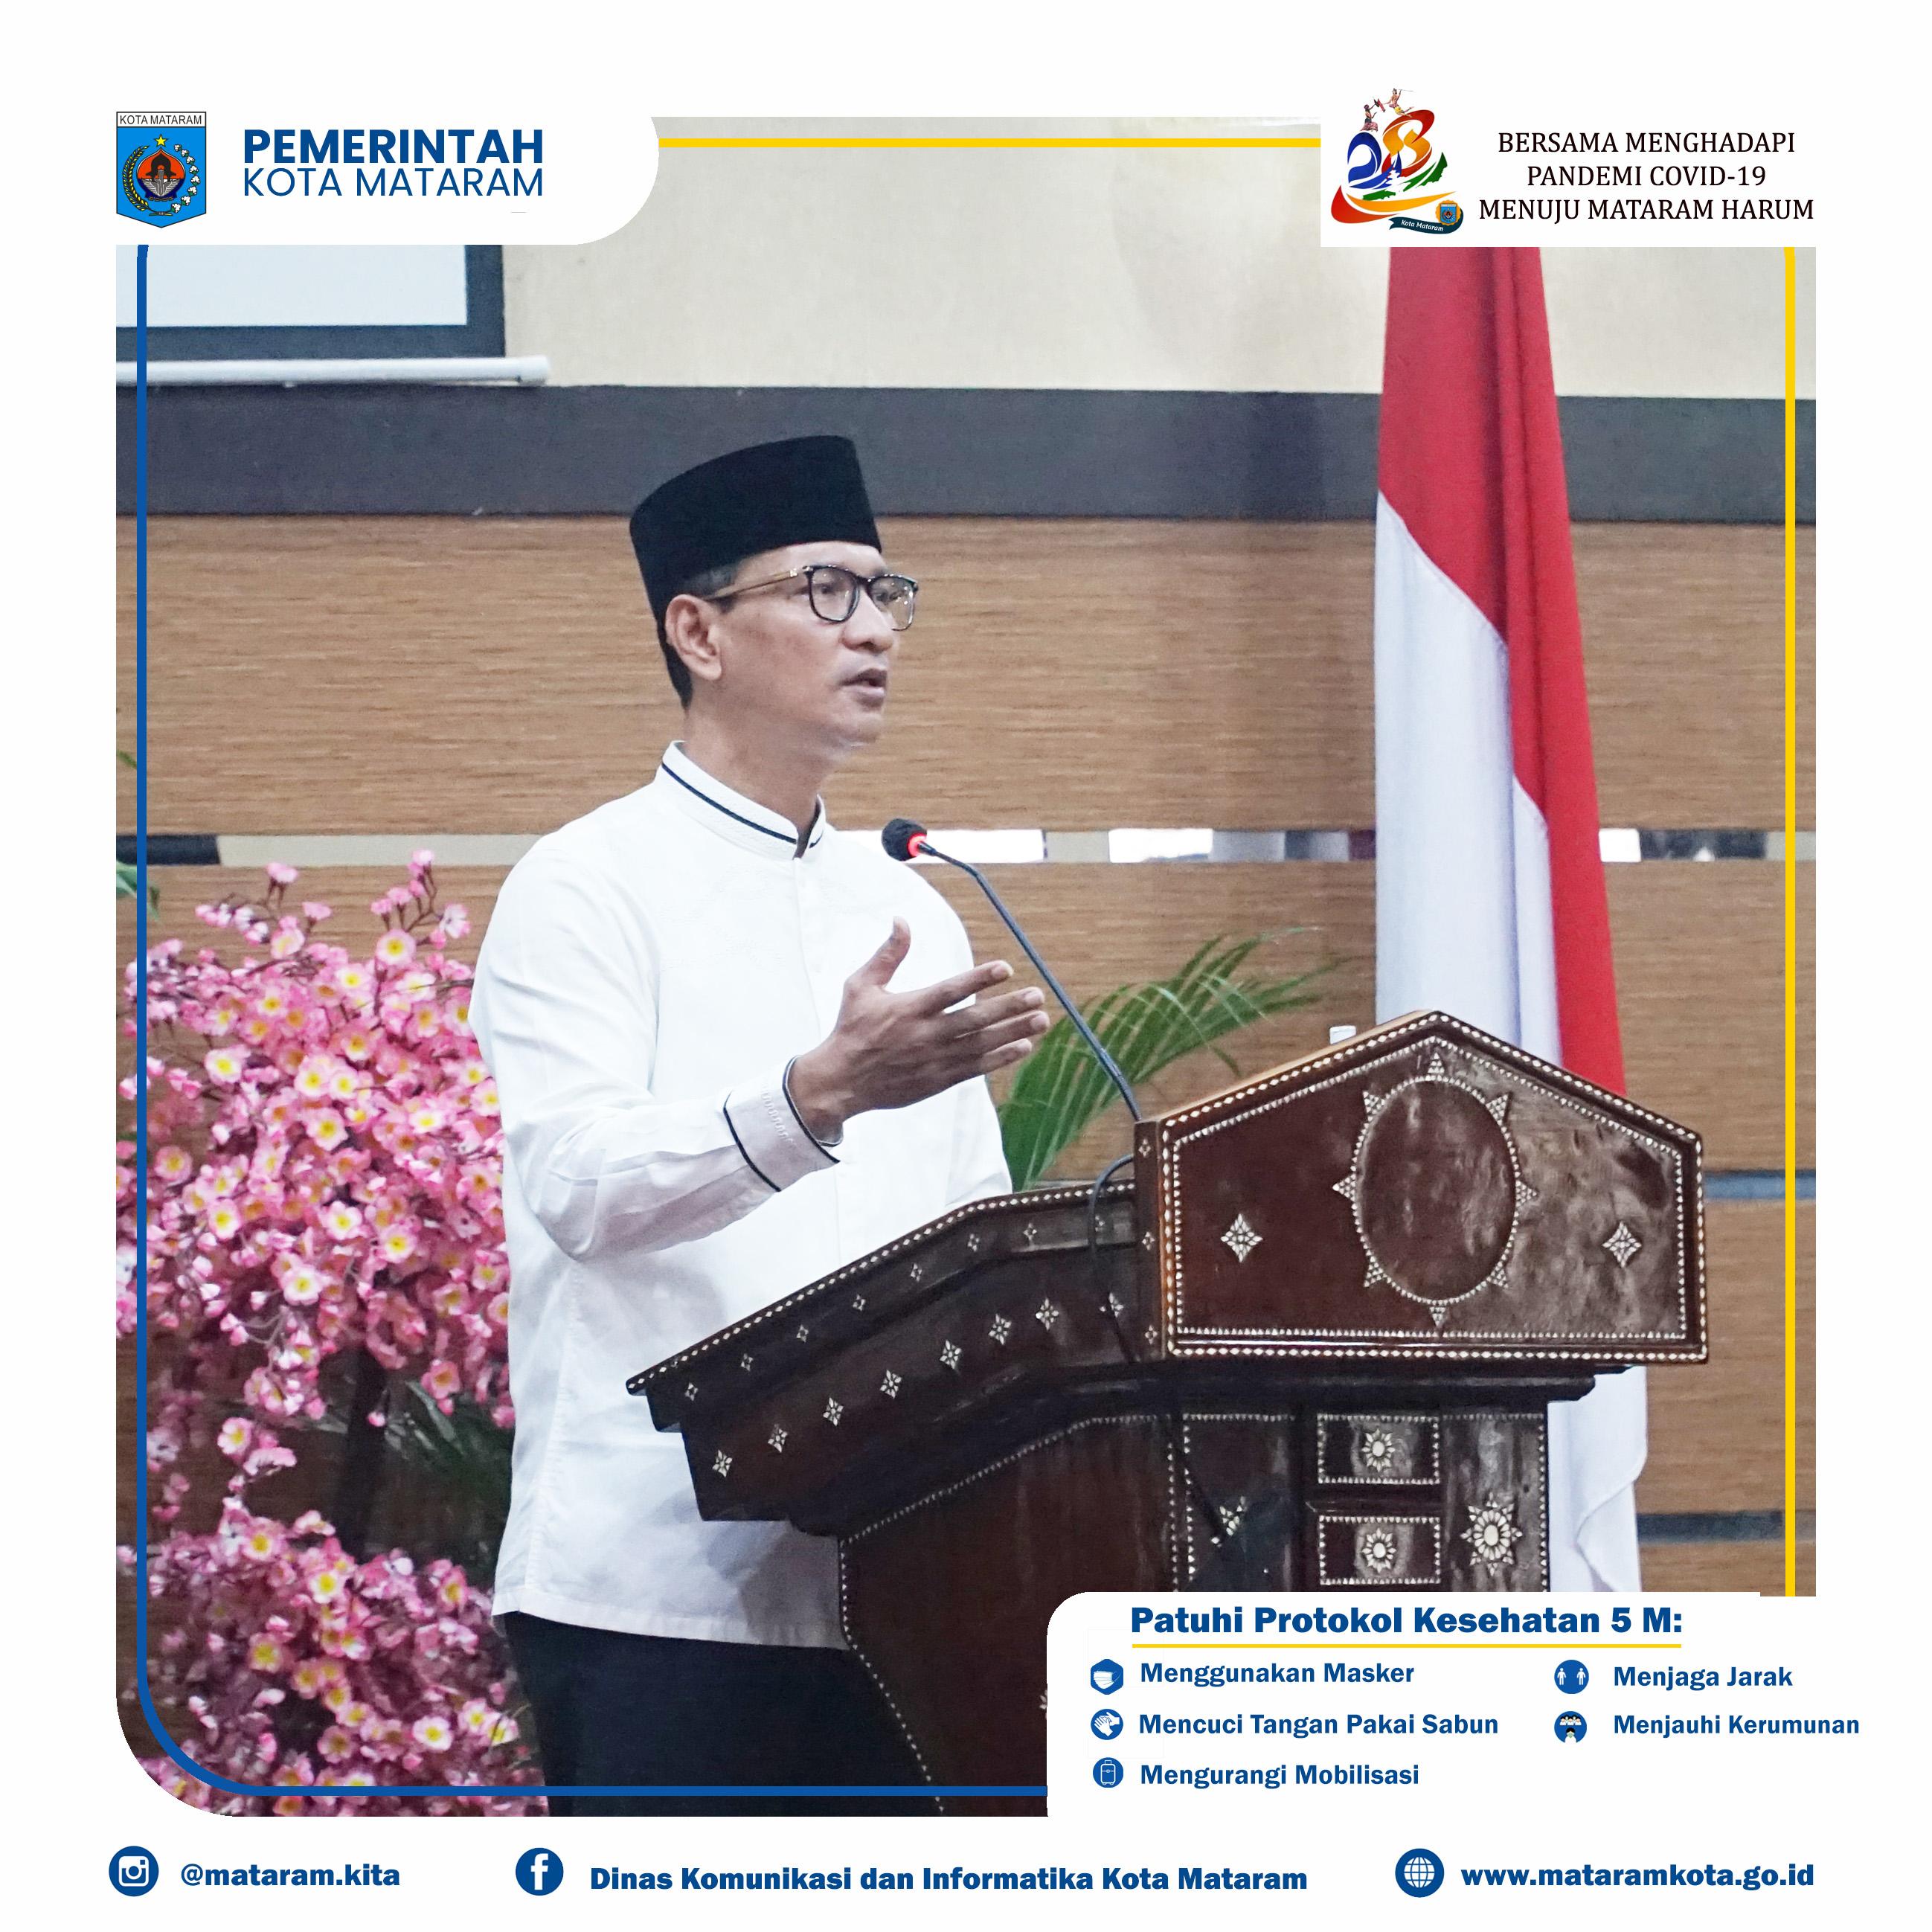 Penyerahan Stimulan Pendamping Ekonomi Wilayah Terdampak Bencana Kota Mataram Provinsi NTB.